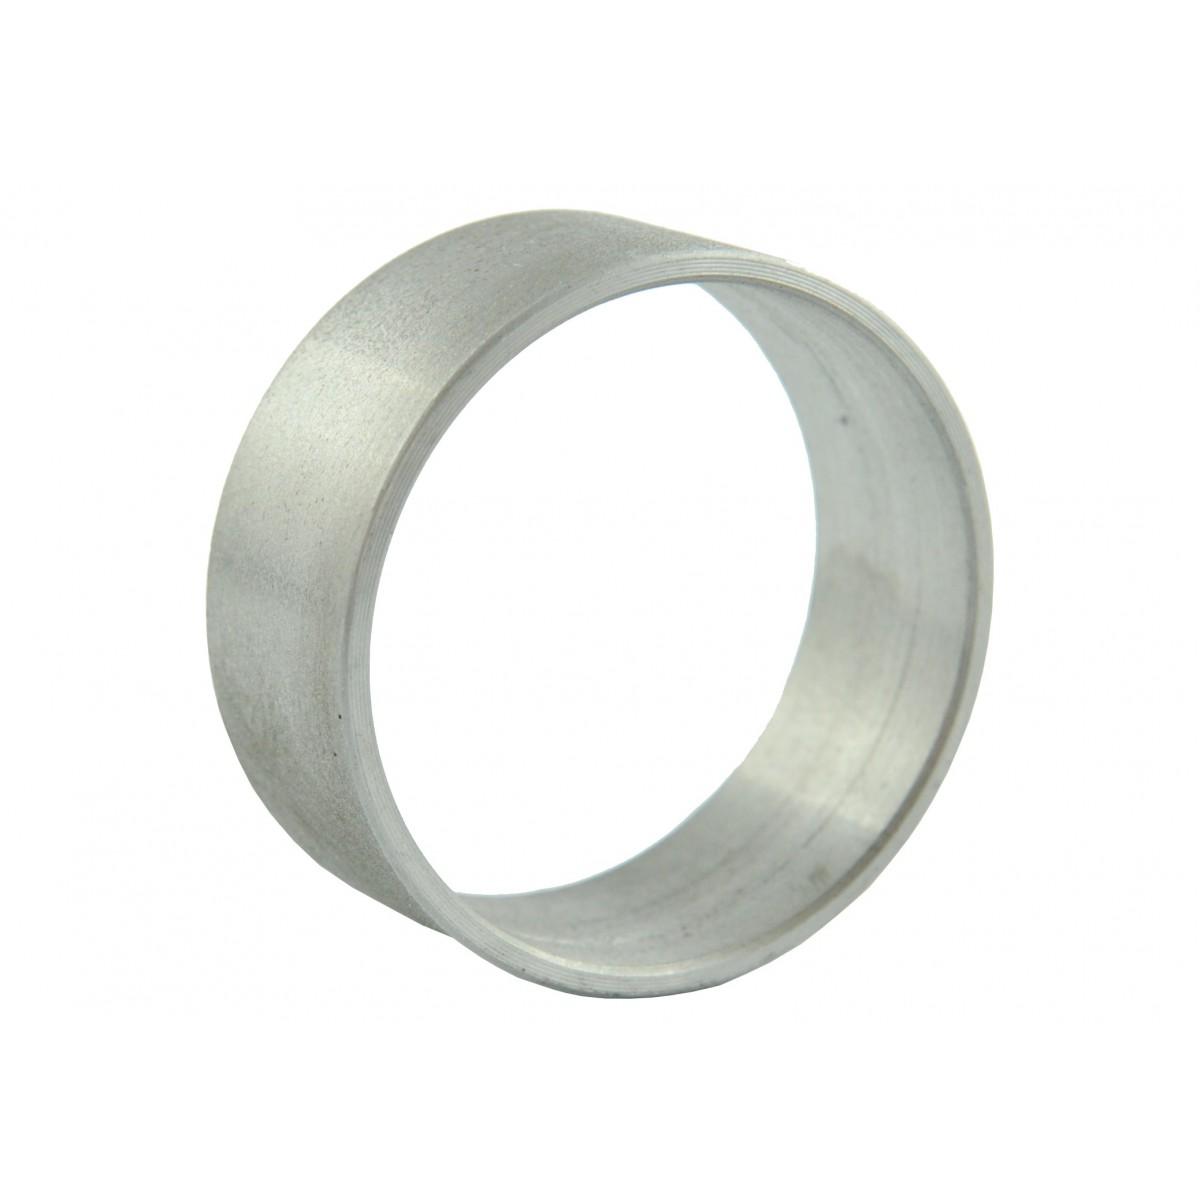 Sleeve bushing 22x50x55 mm ring